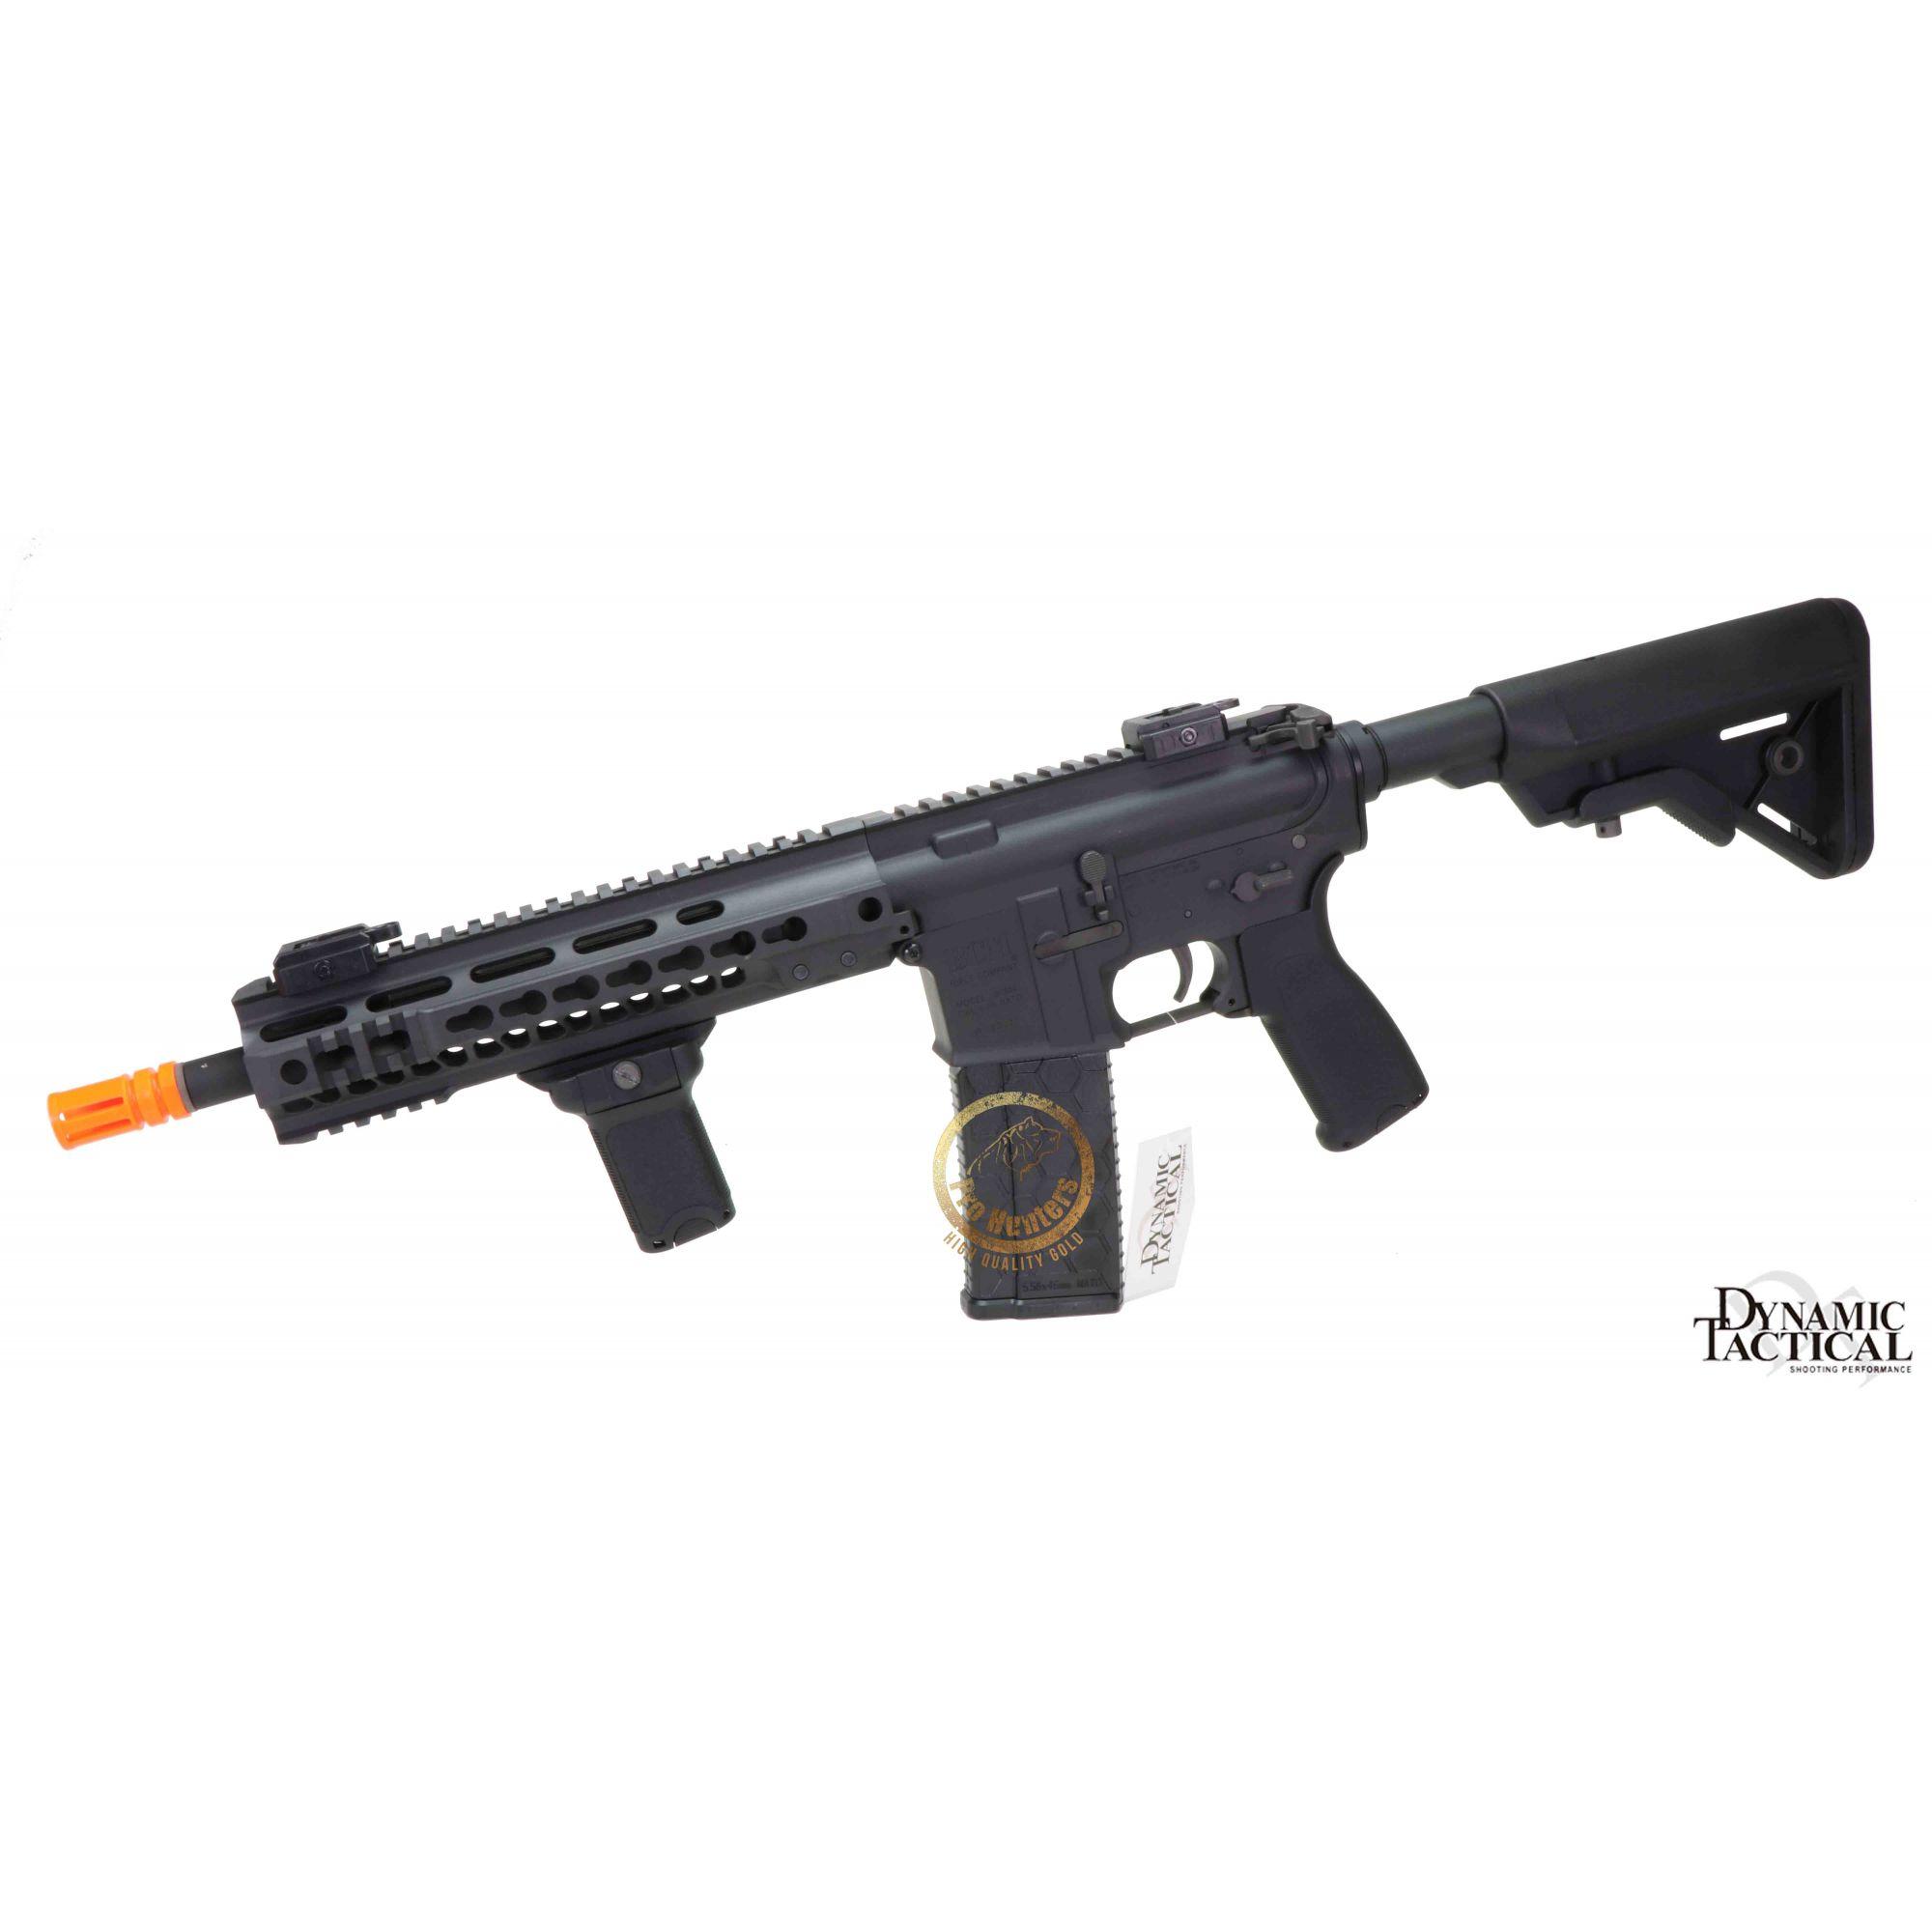 Rifle Airsoft Dytac MK4 SMR 10.5 Pol  - Black